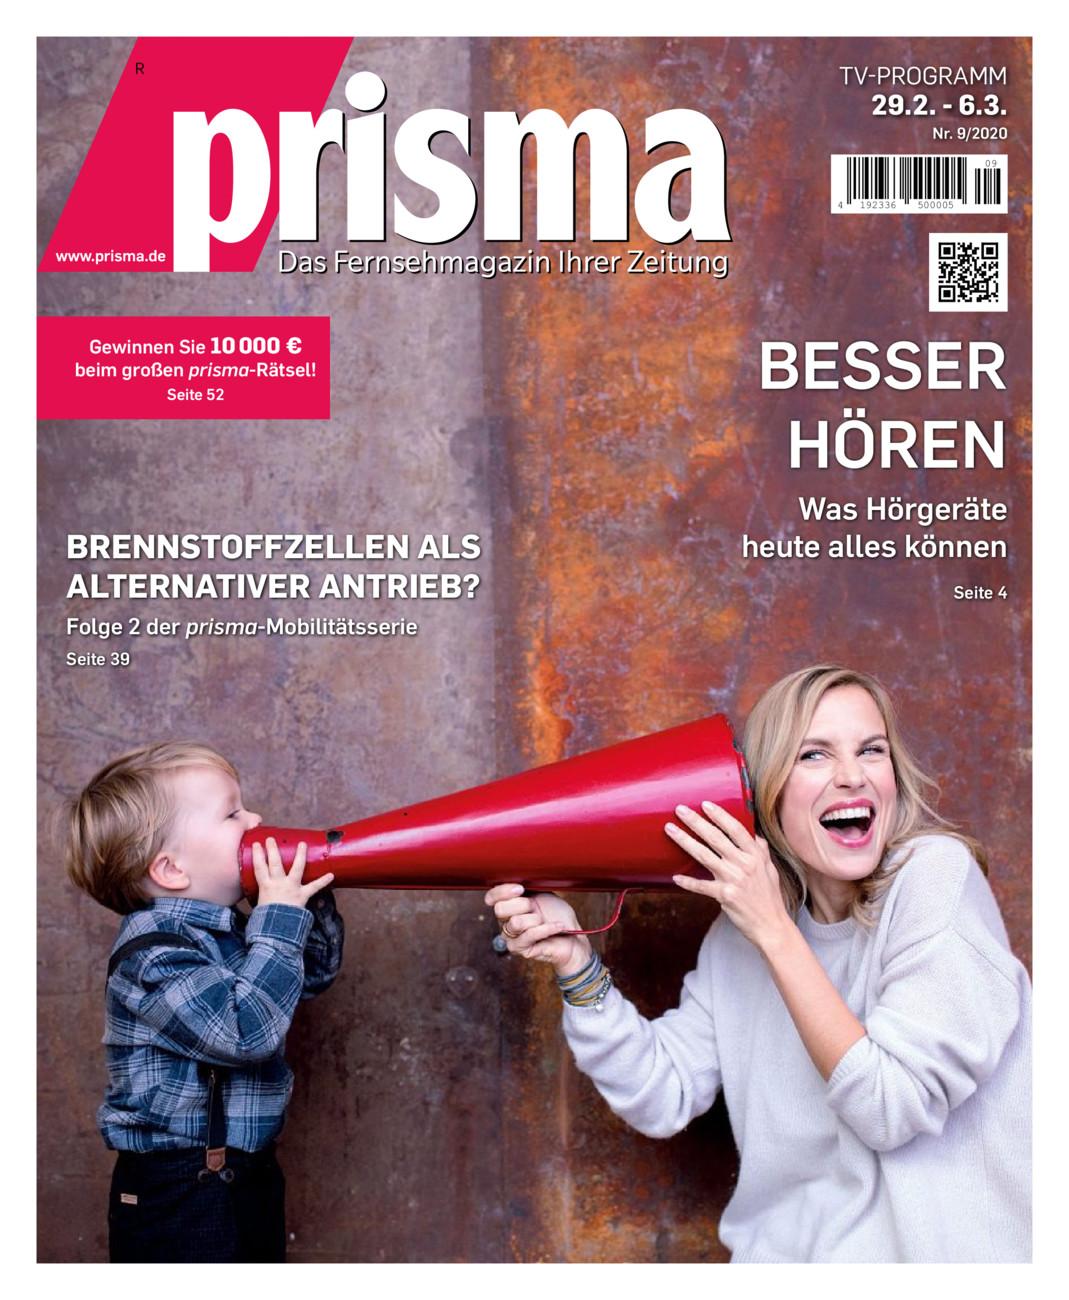 Prisma 29.2 - 6.3